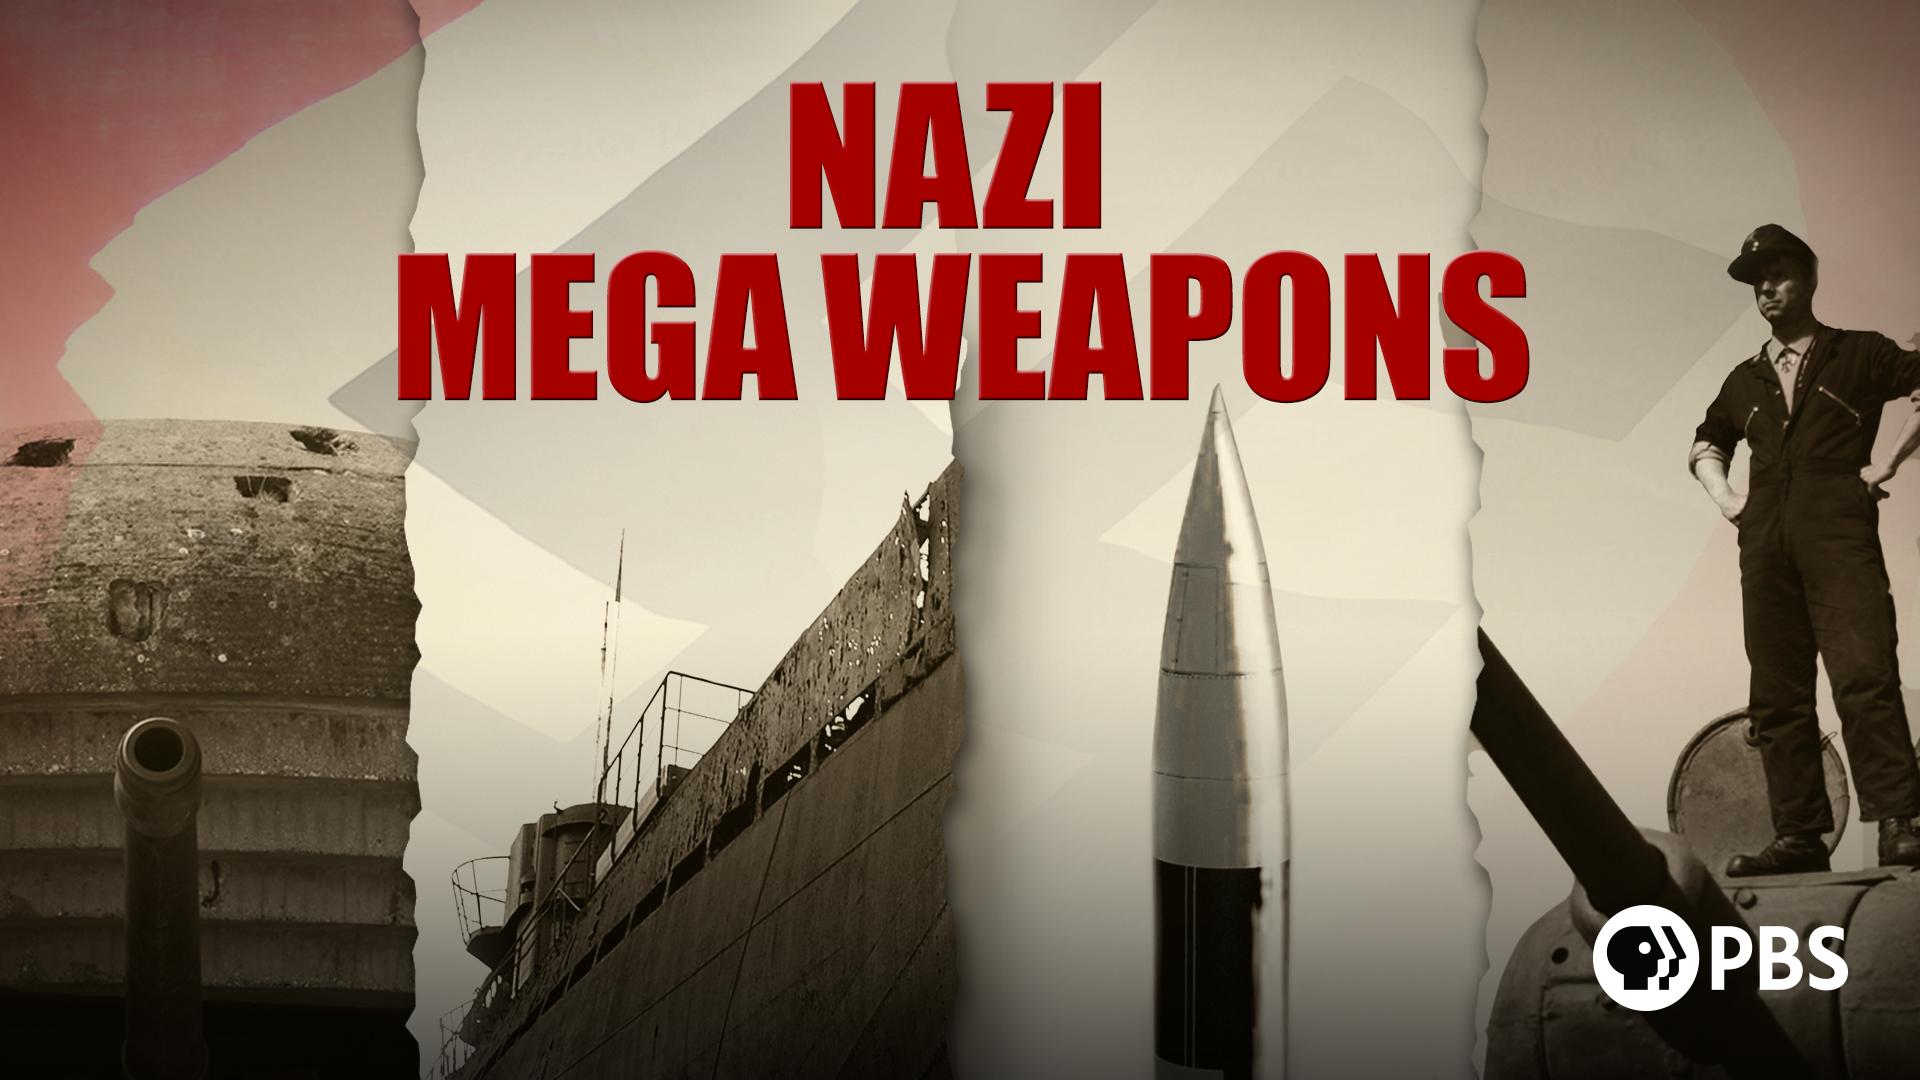 Nazi Mega Weapons, Volume One